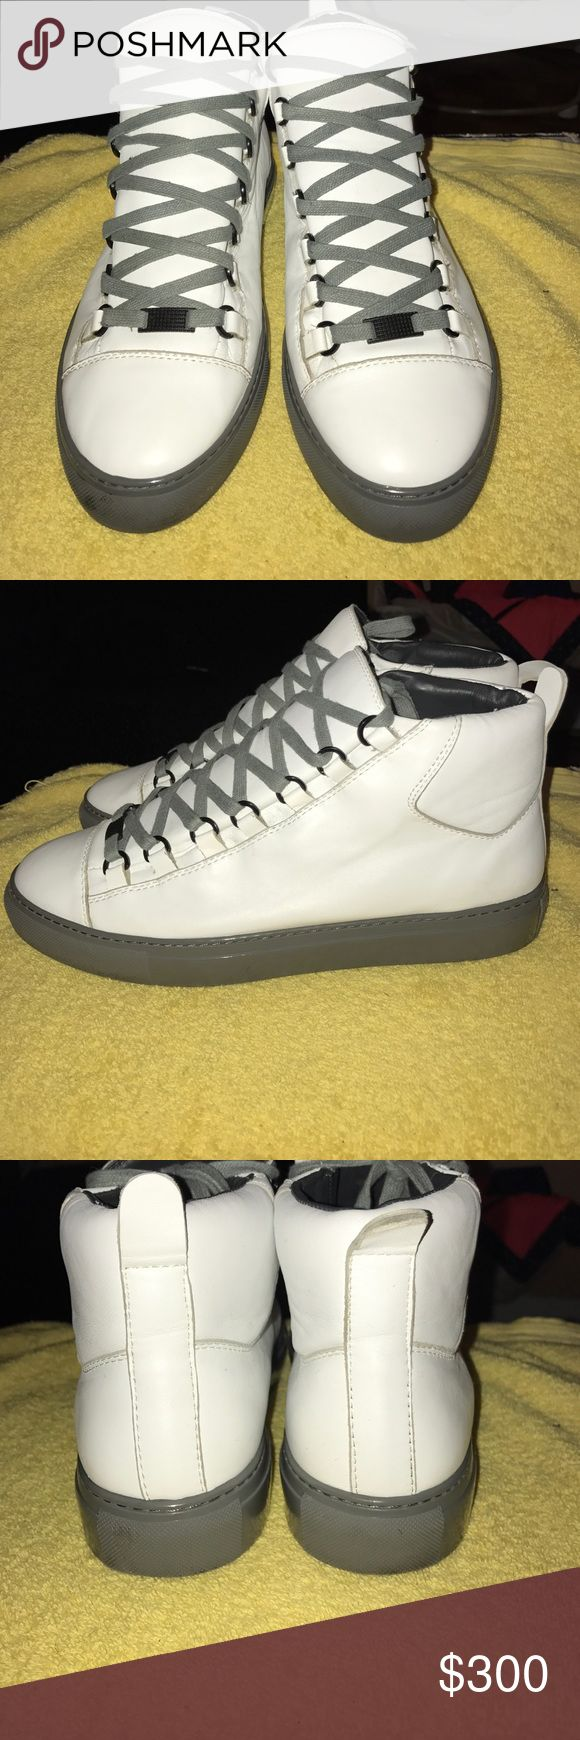 Lyst - Balenciaga Sneakers - Men's High & Low Top Shoes